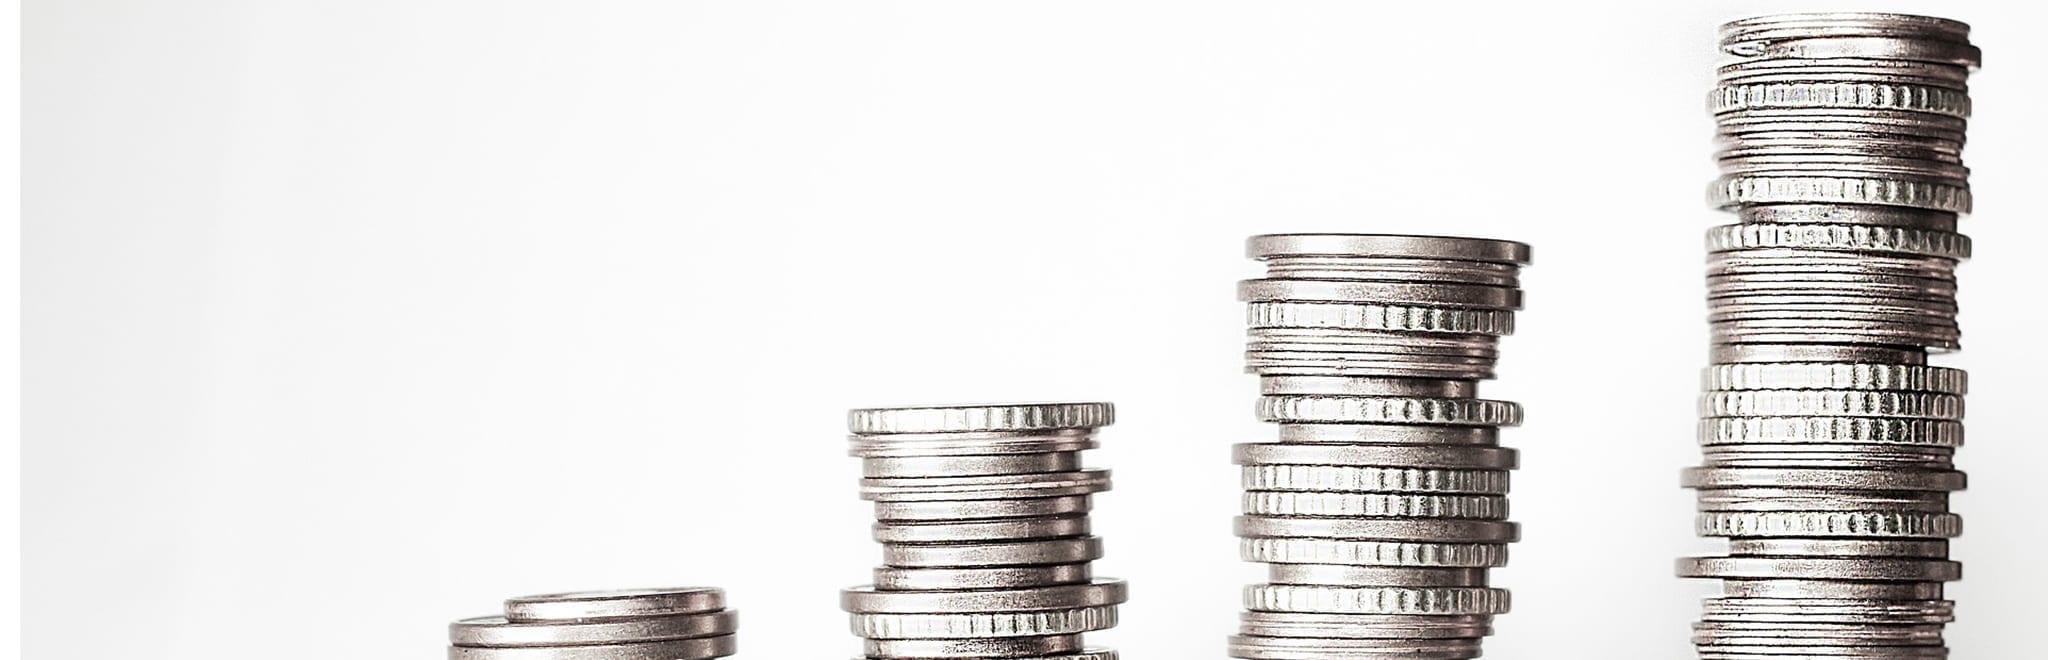 Afbeelding: Digitalisering vraagt om een ander kaliber finance professional